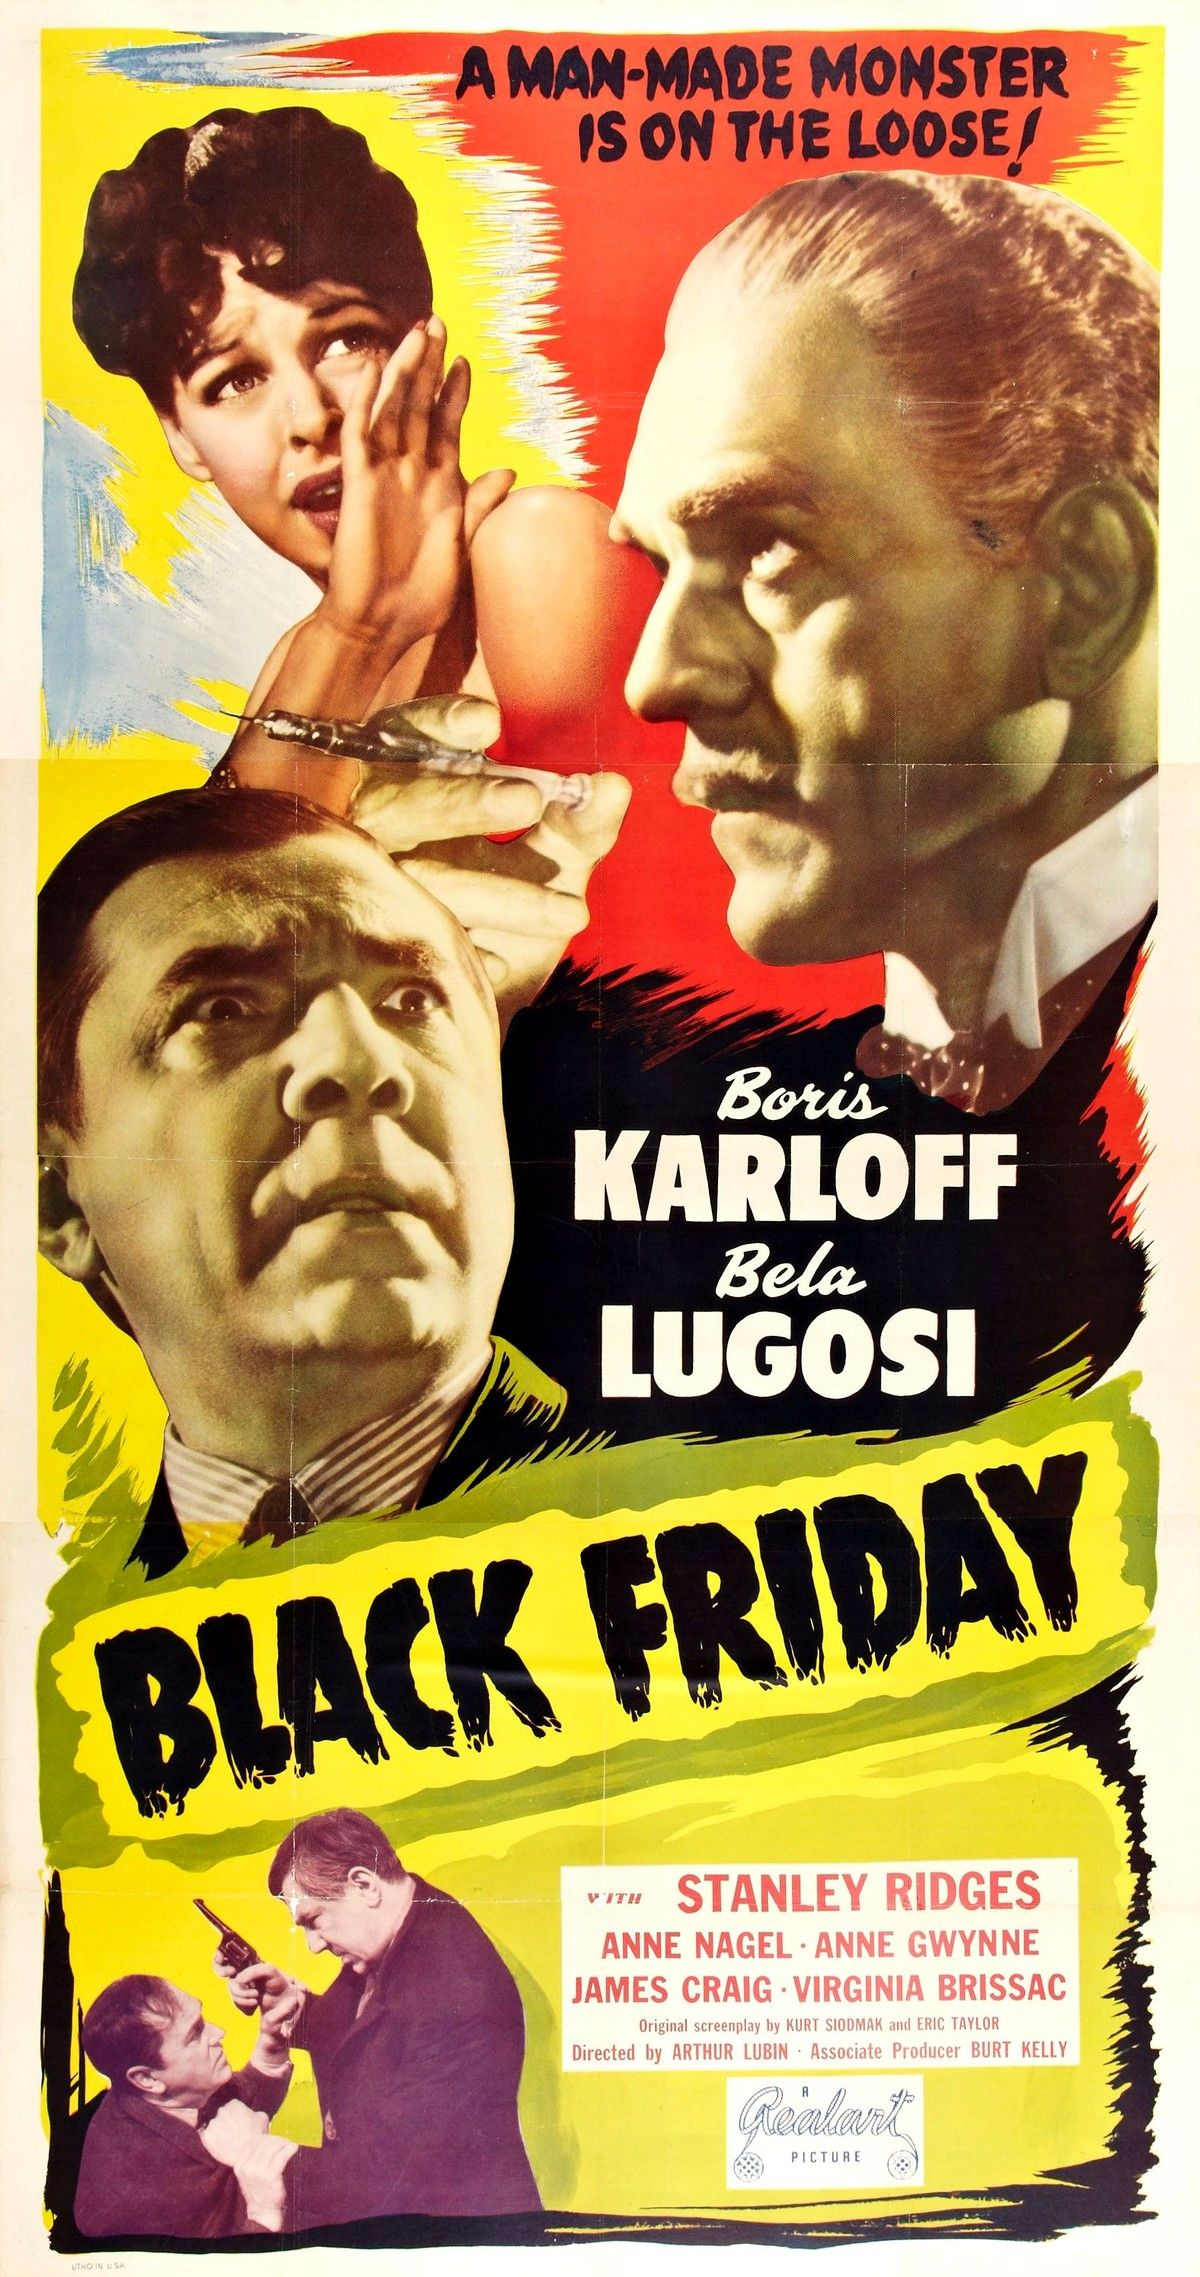 Boris Karloff Bela Lusosi Black Friday Movie Poster V2 Classic Horror Movies Posters Black Friday Poster Boris Karloff Movies